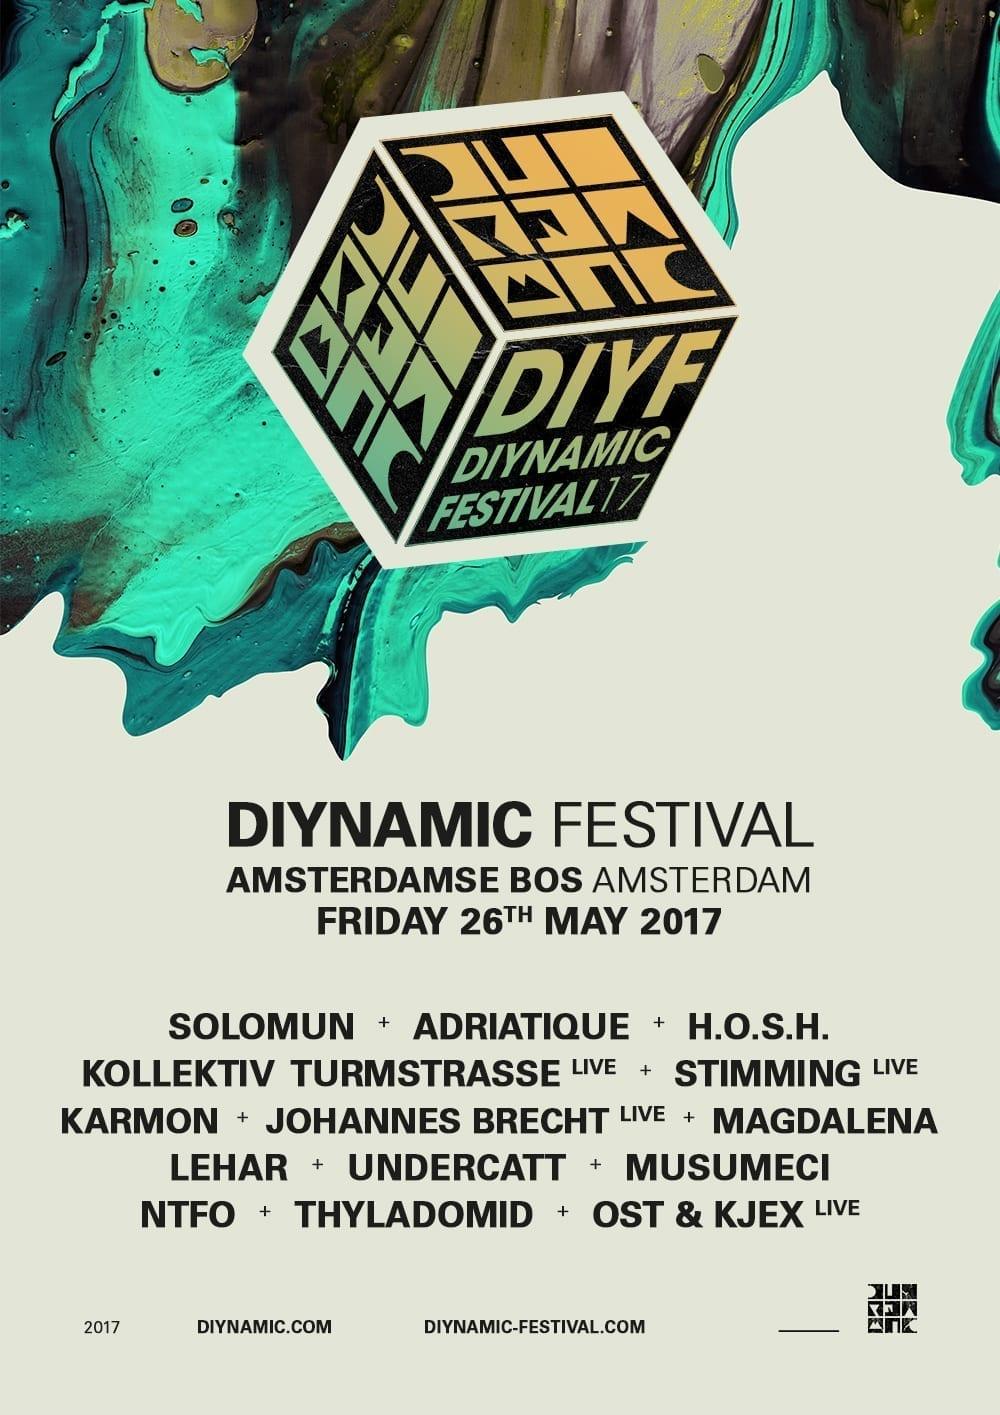 Diynamic Festival @ Amsterdamse Bos